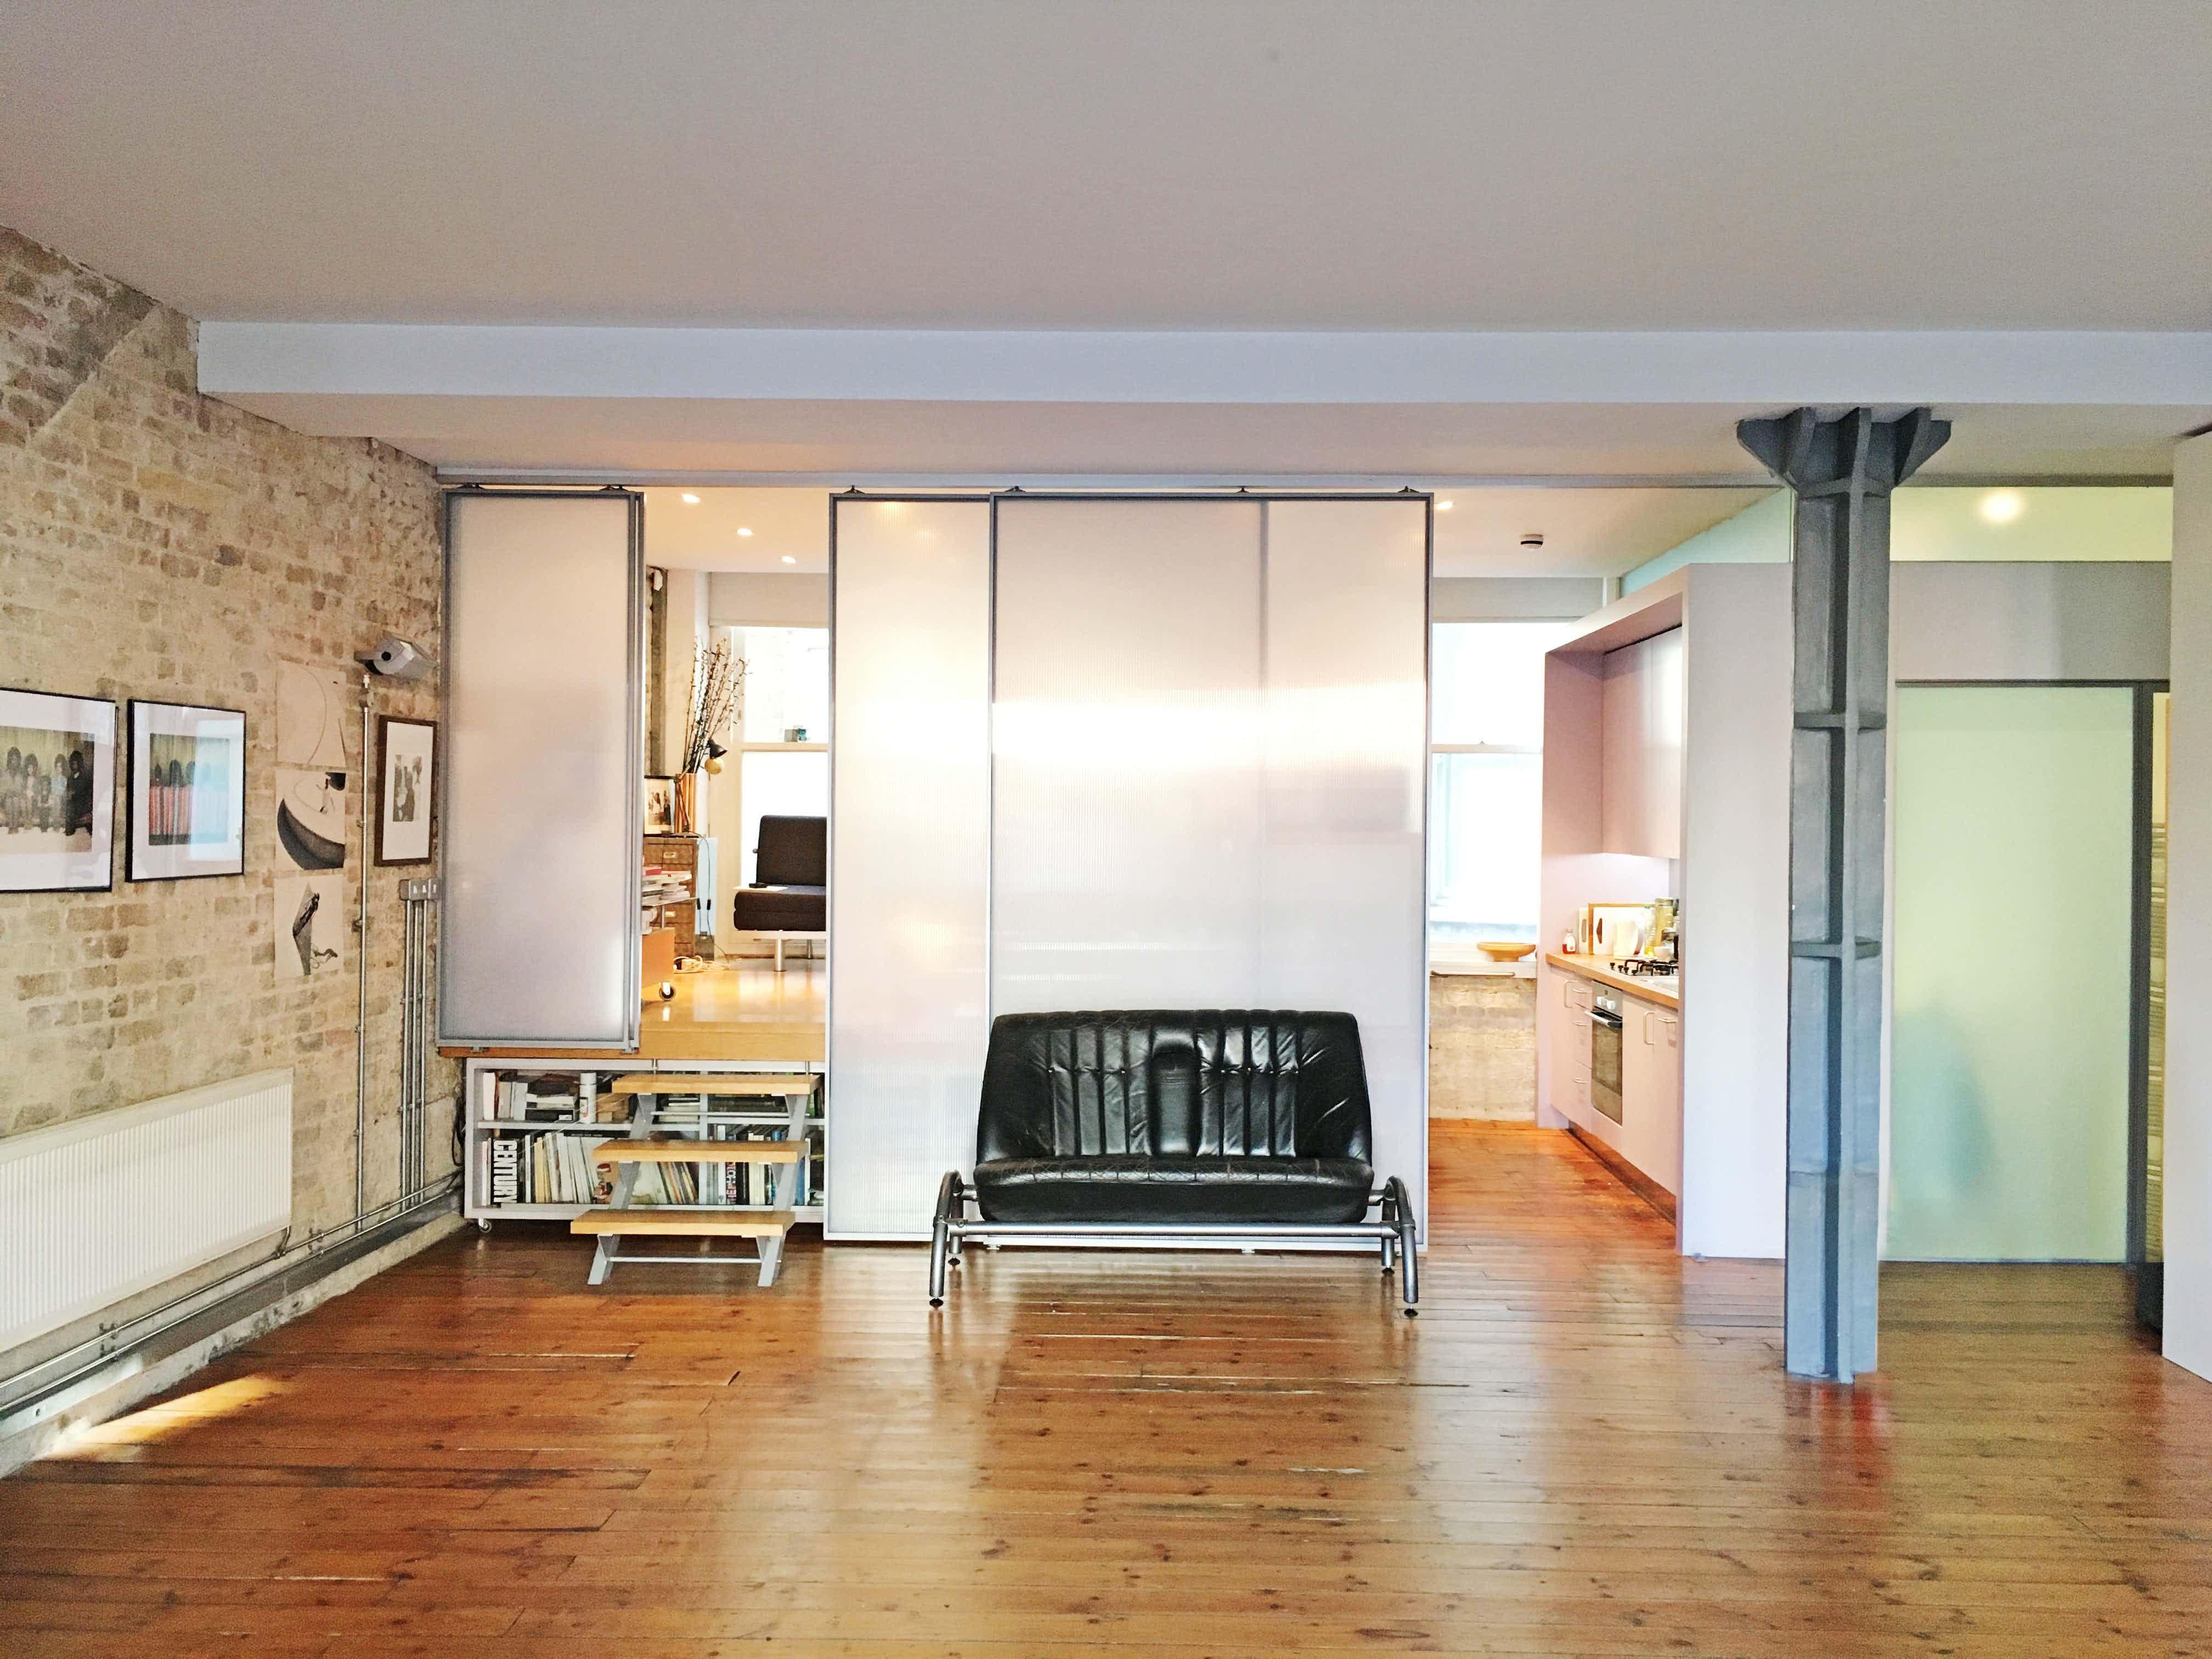 Studio, Paul Street